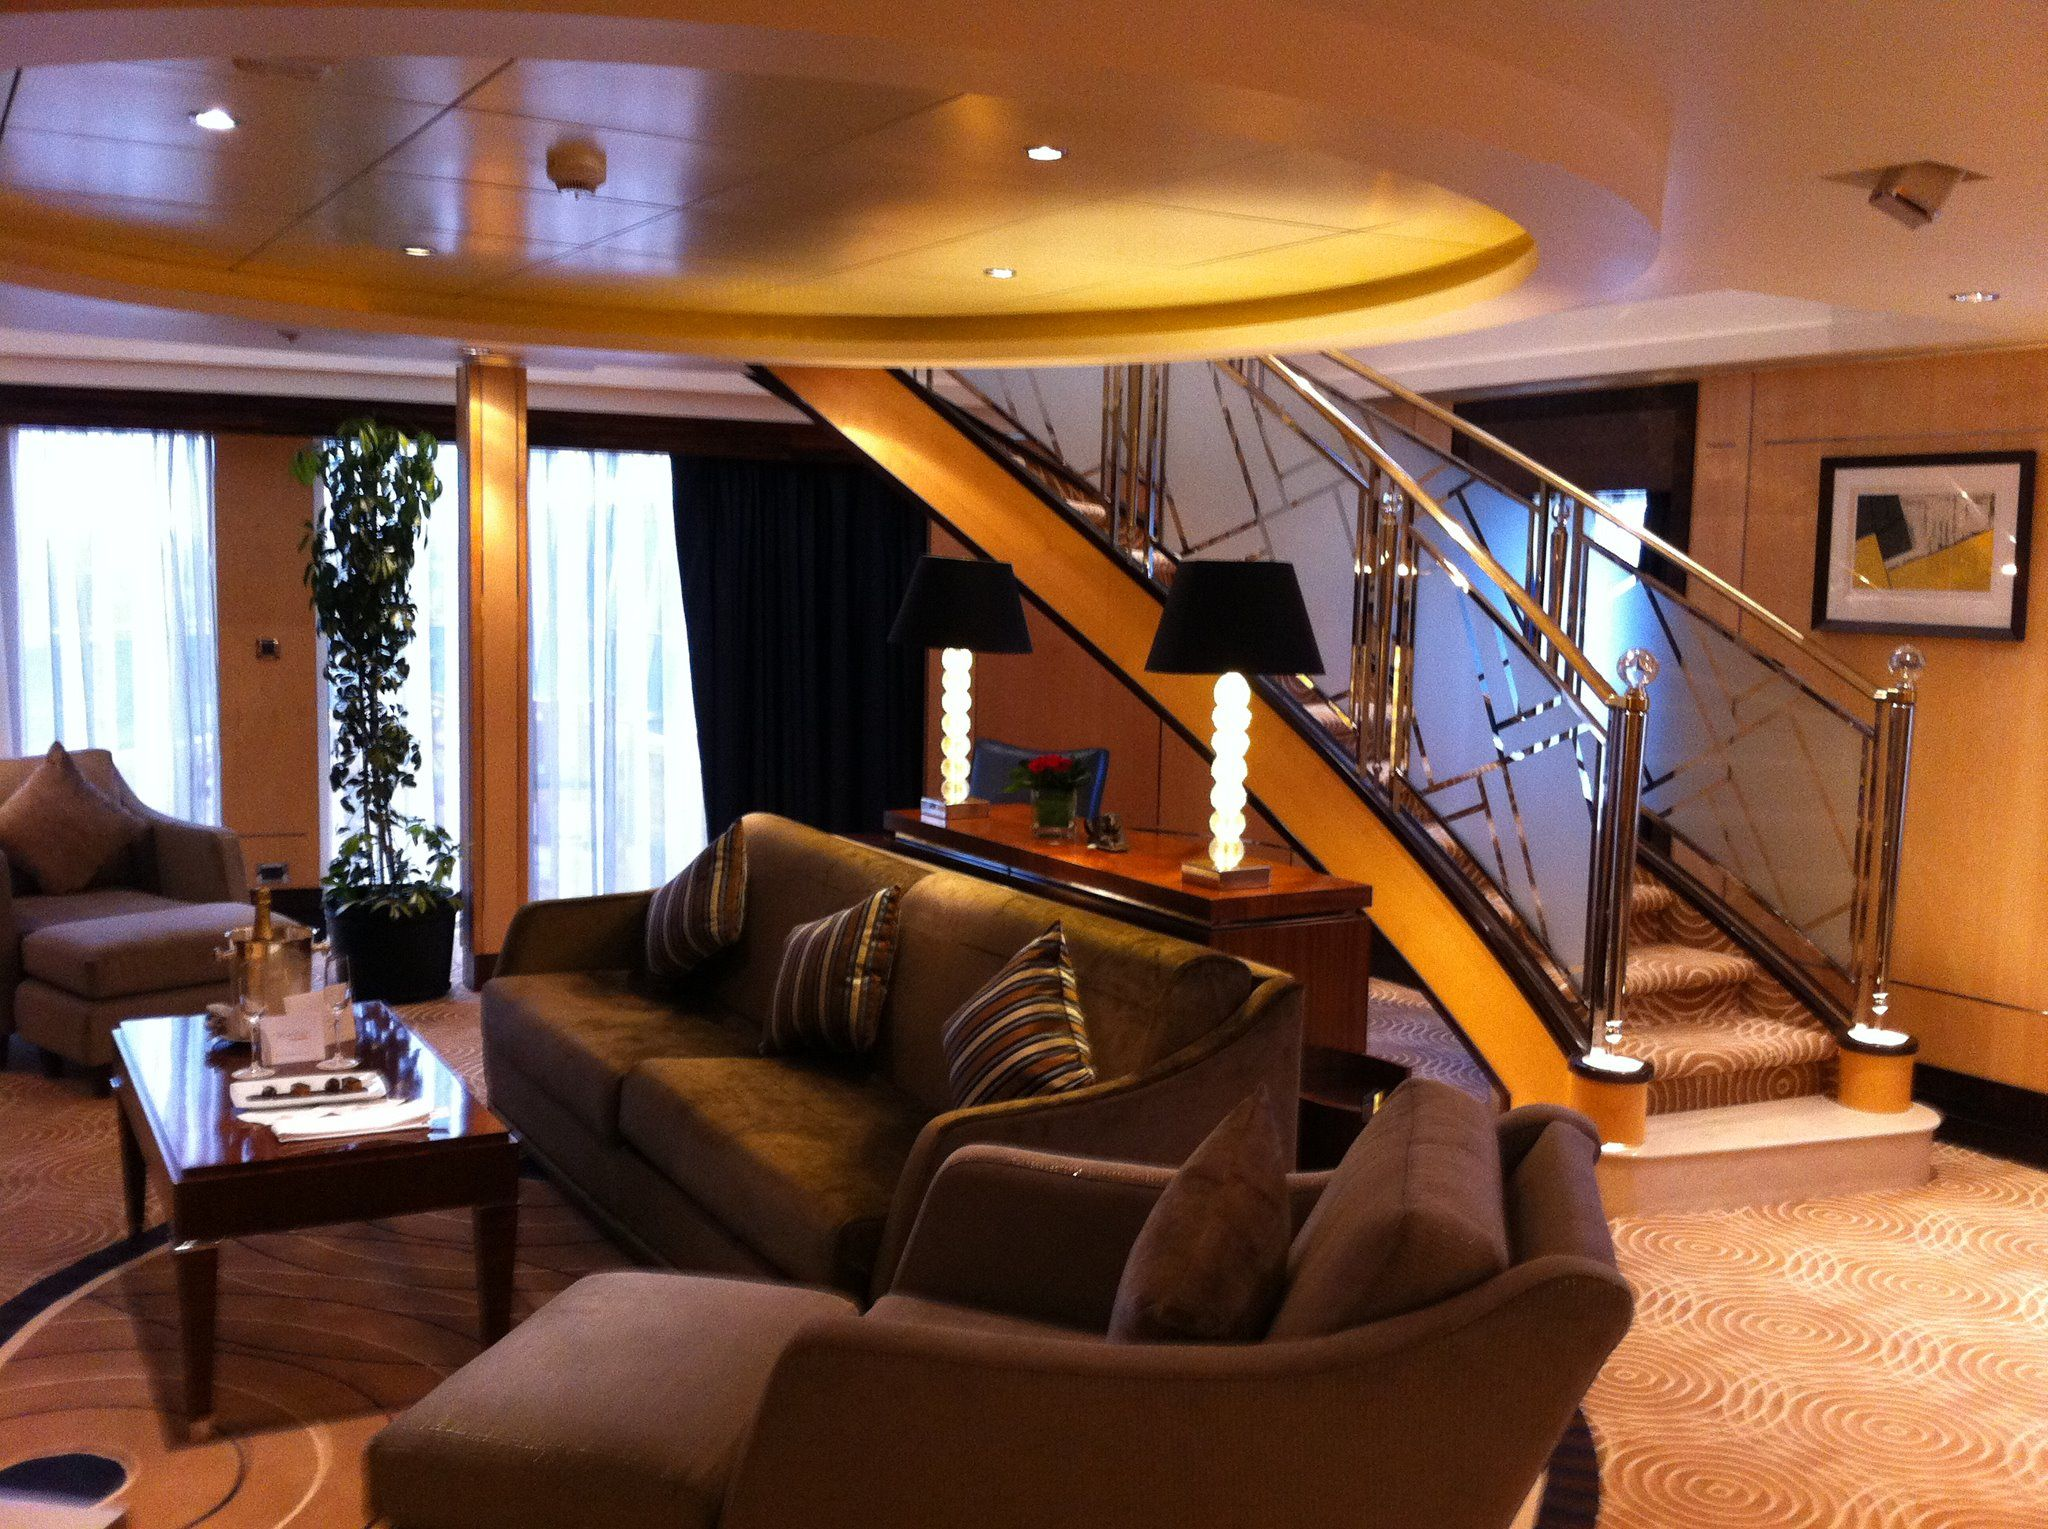 rms queen mary interior - Google Search   RMS Queen Mary ...